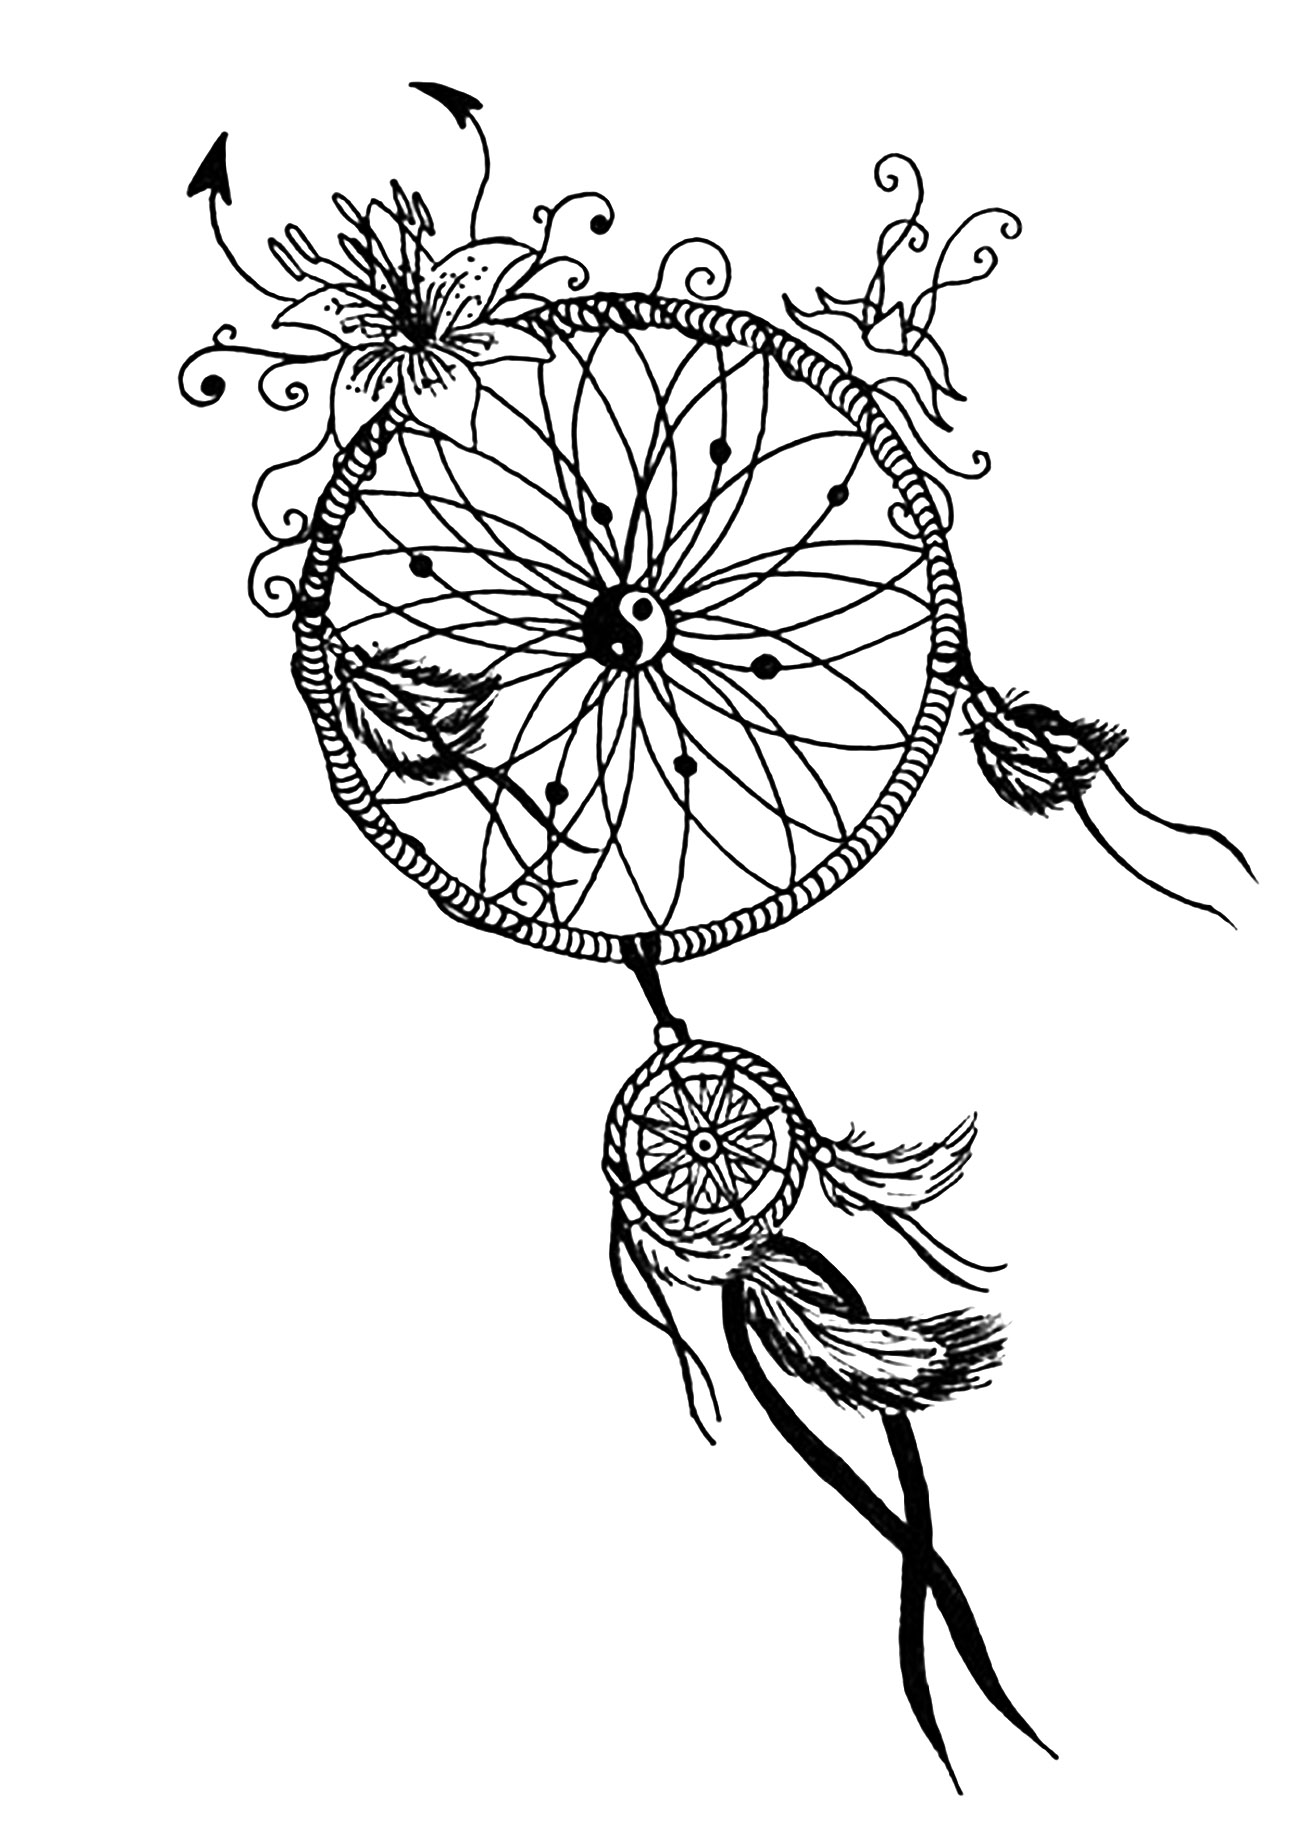 Mandala to download free dreamcatcher